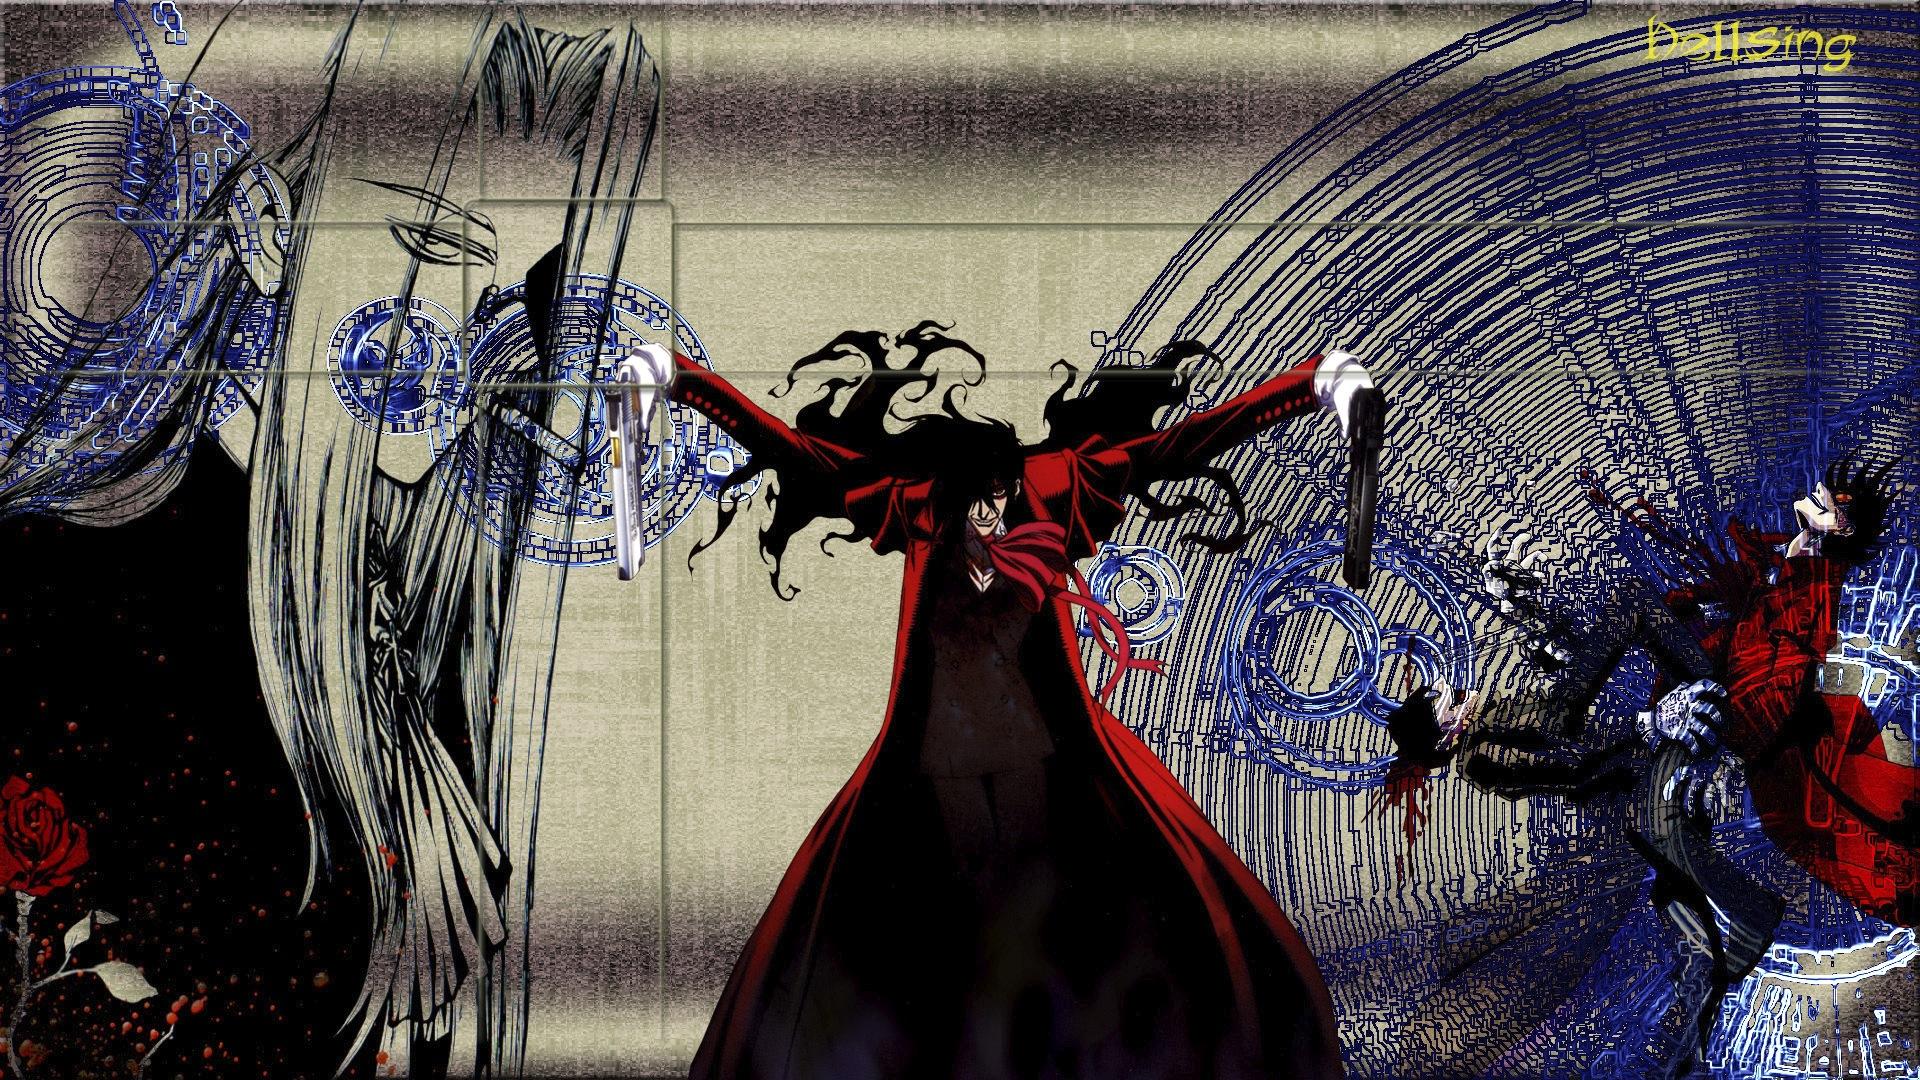 Hellsing full hd wallpaper and background image - Full hd anime wallpaper pack ...